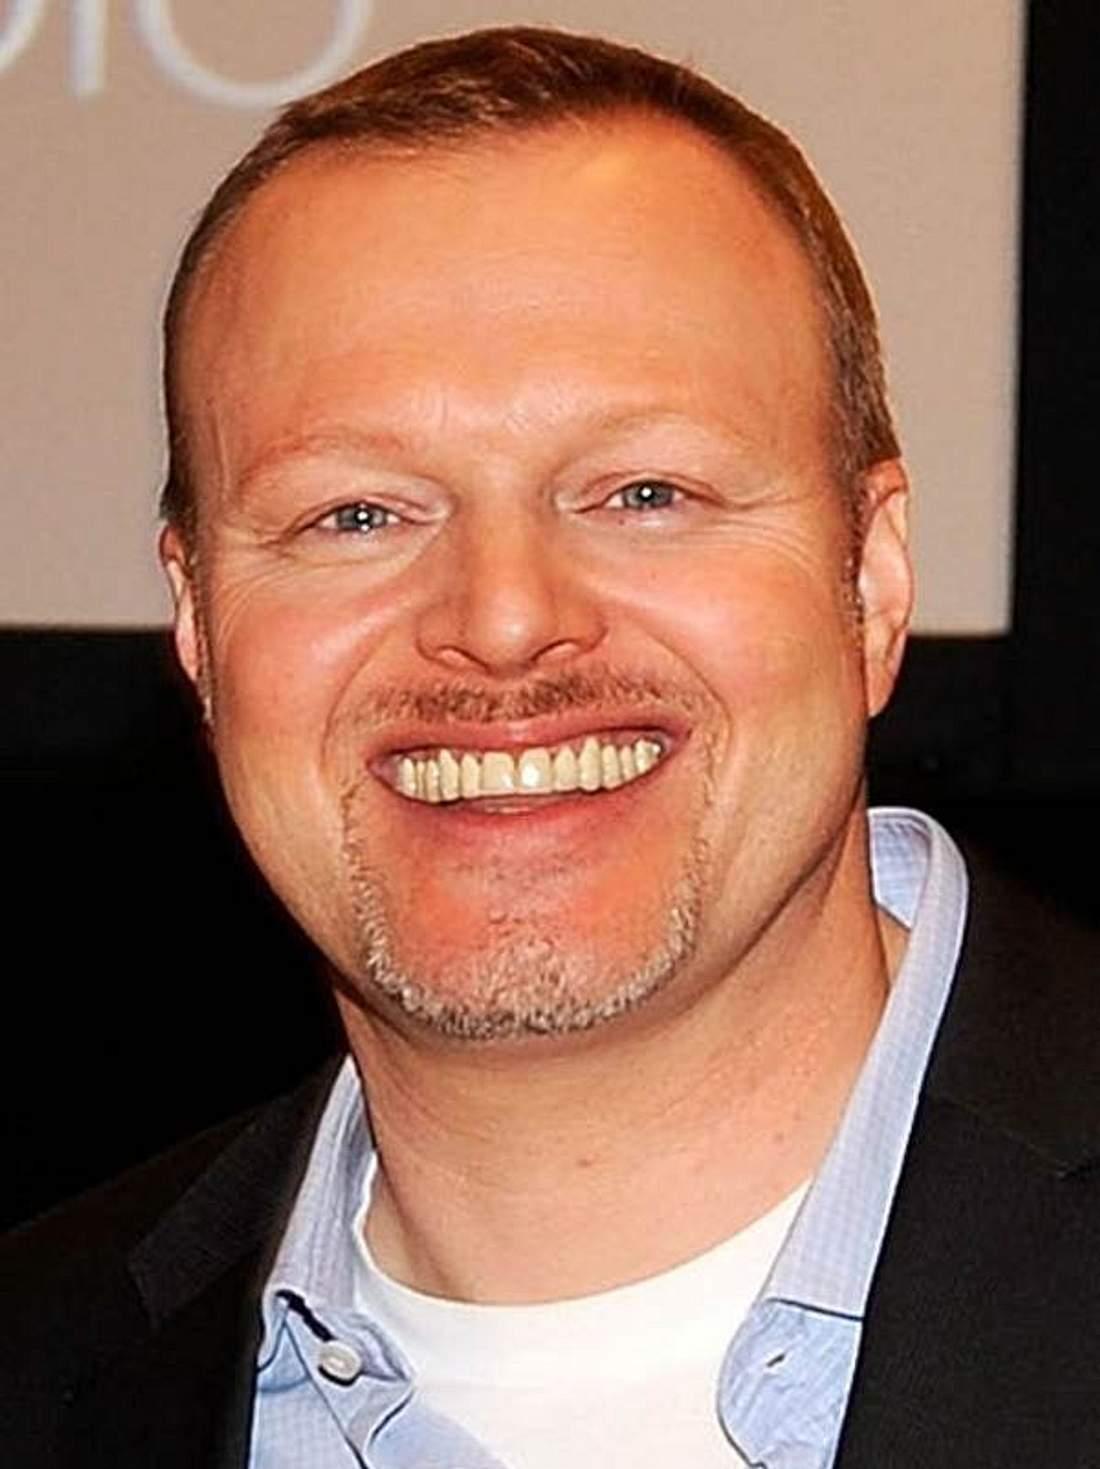 Stefan Raab schmeißt beim Eurovision Song Contest hin!